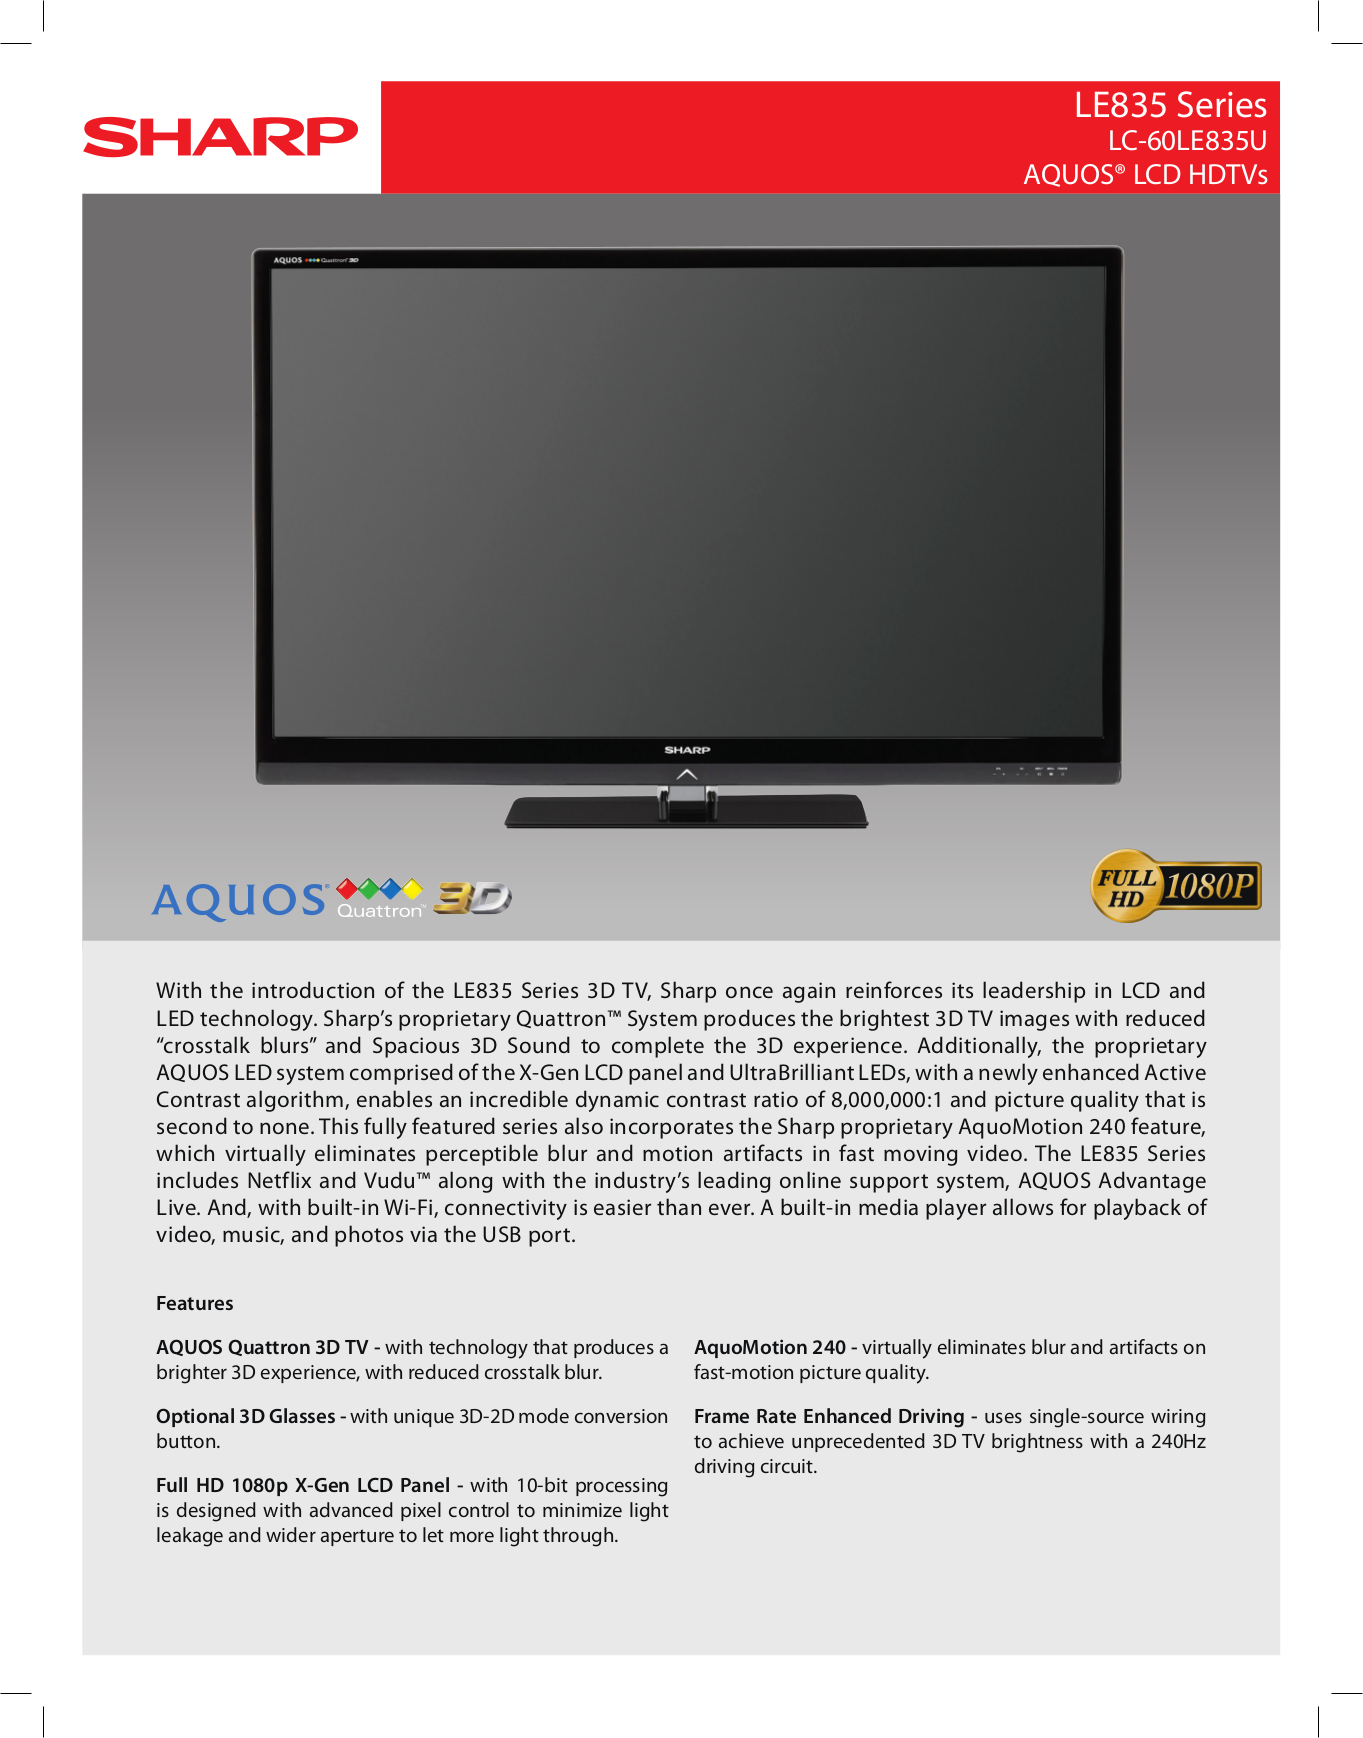 download free pdf for sharp aquos lc 60le835u tv manual rh umlib com Sharp ManualsOnline Sharp ManualsOnline